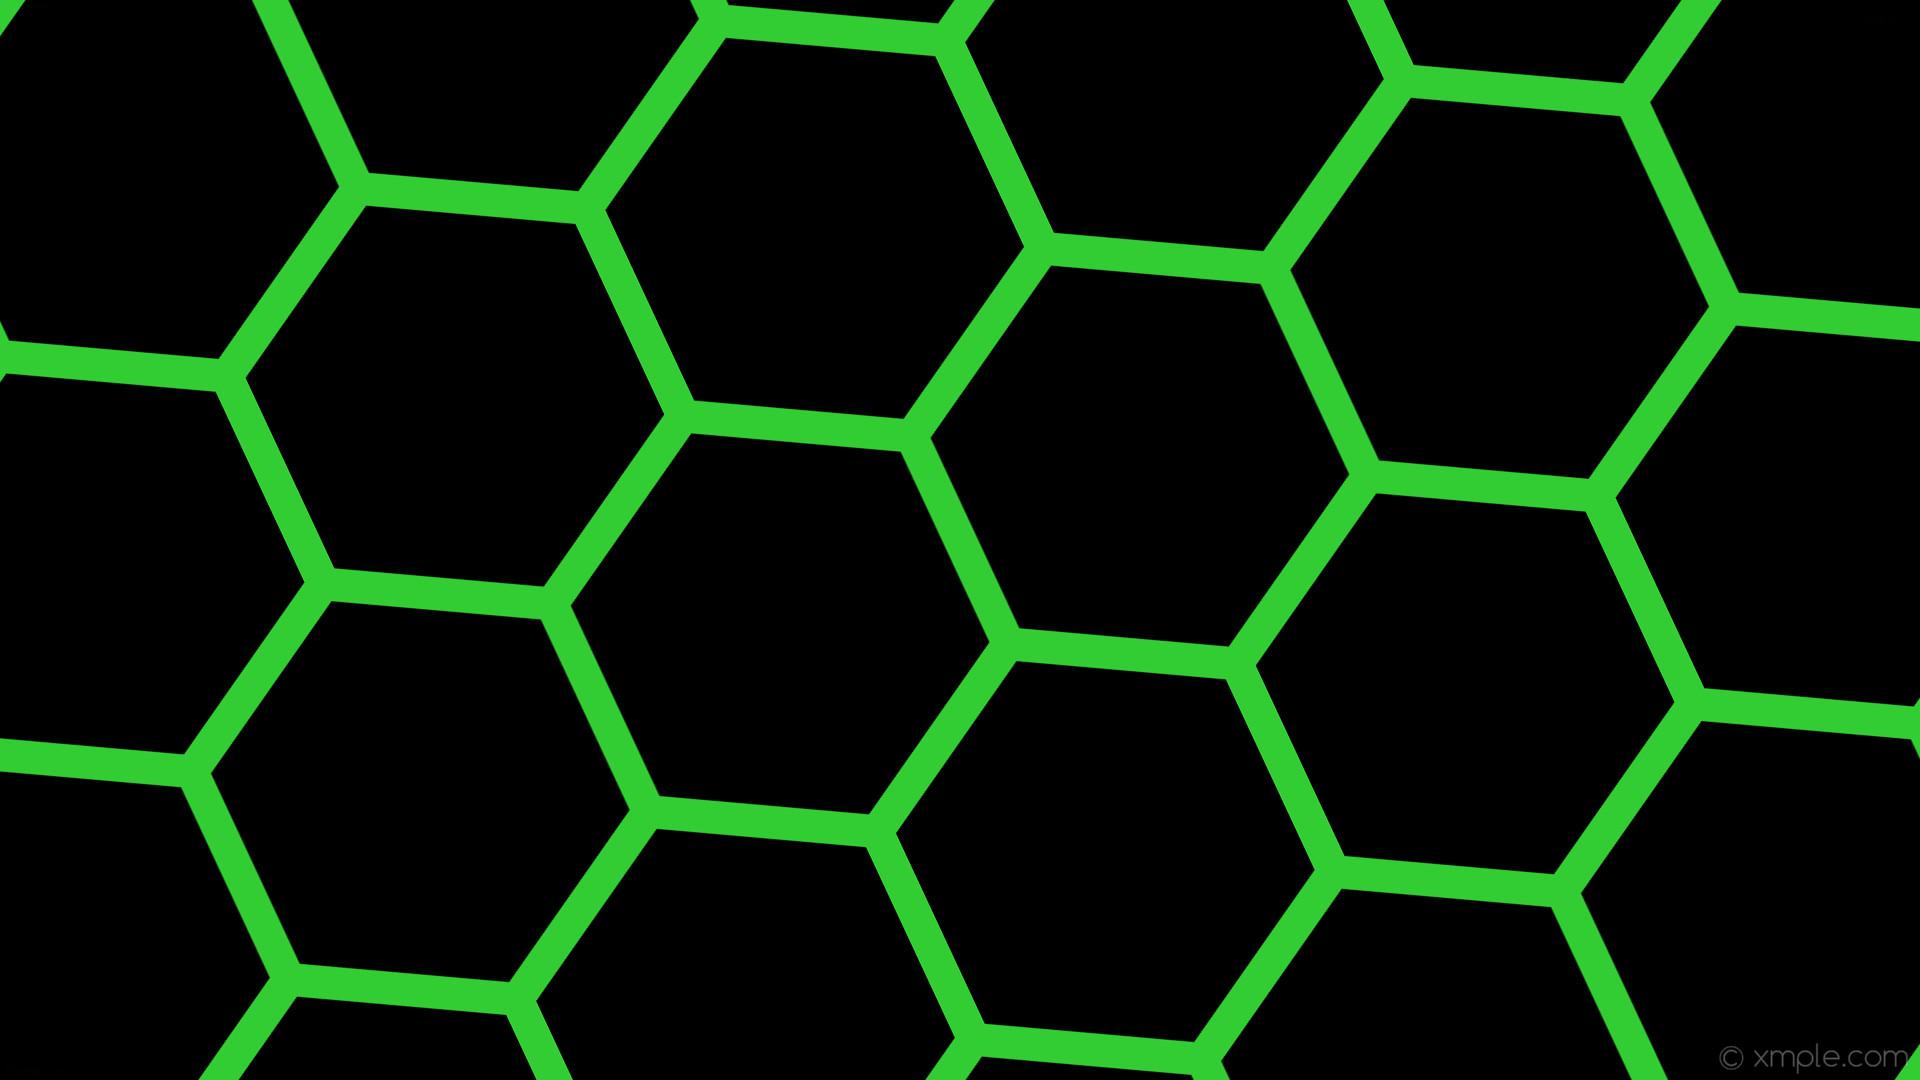 wallpaper green black honeycomb hexagon beehive lime green #000000 #32cd32  diagonal 25° 33px